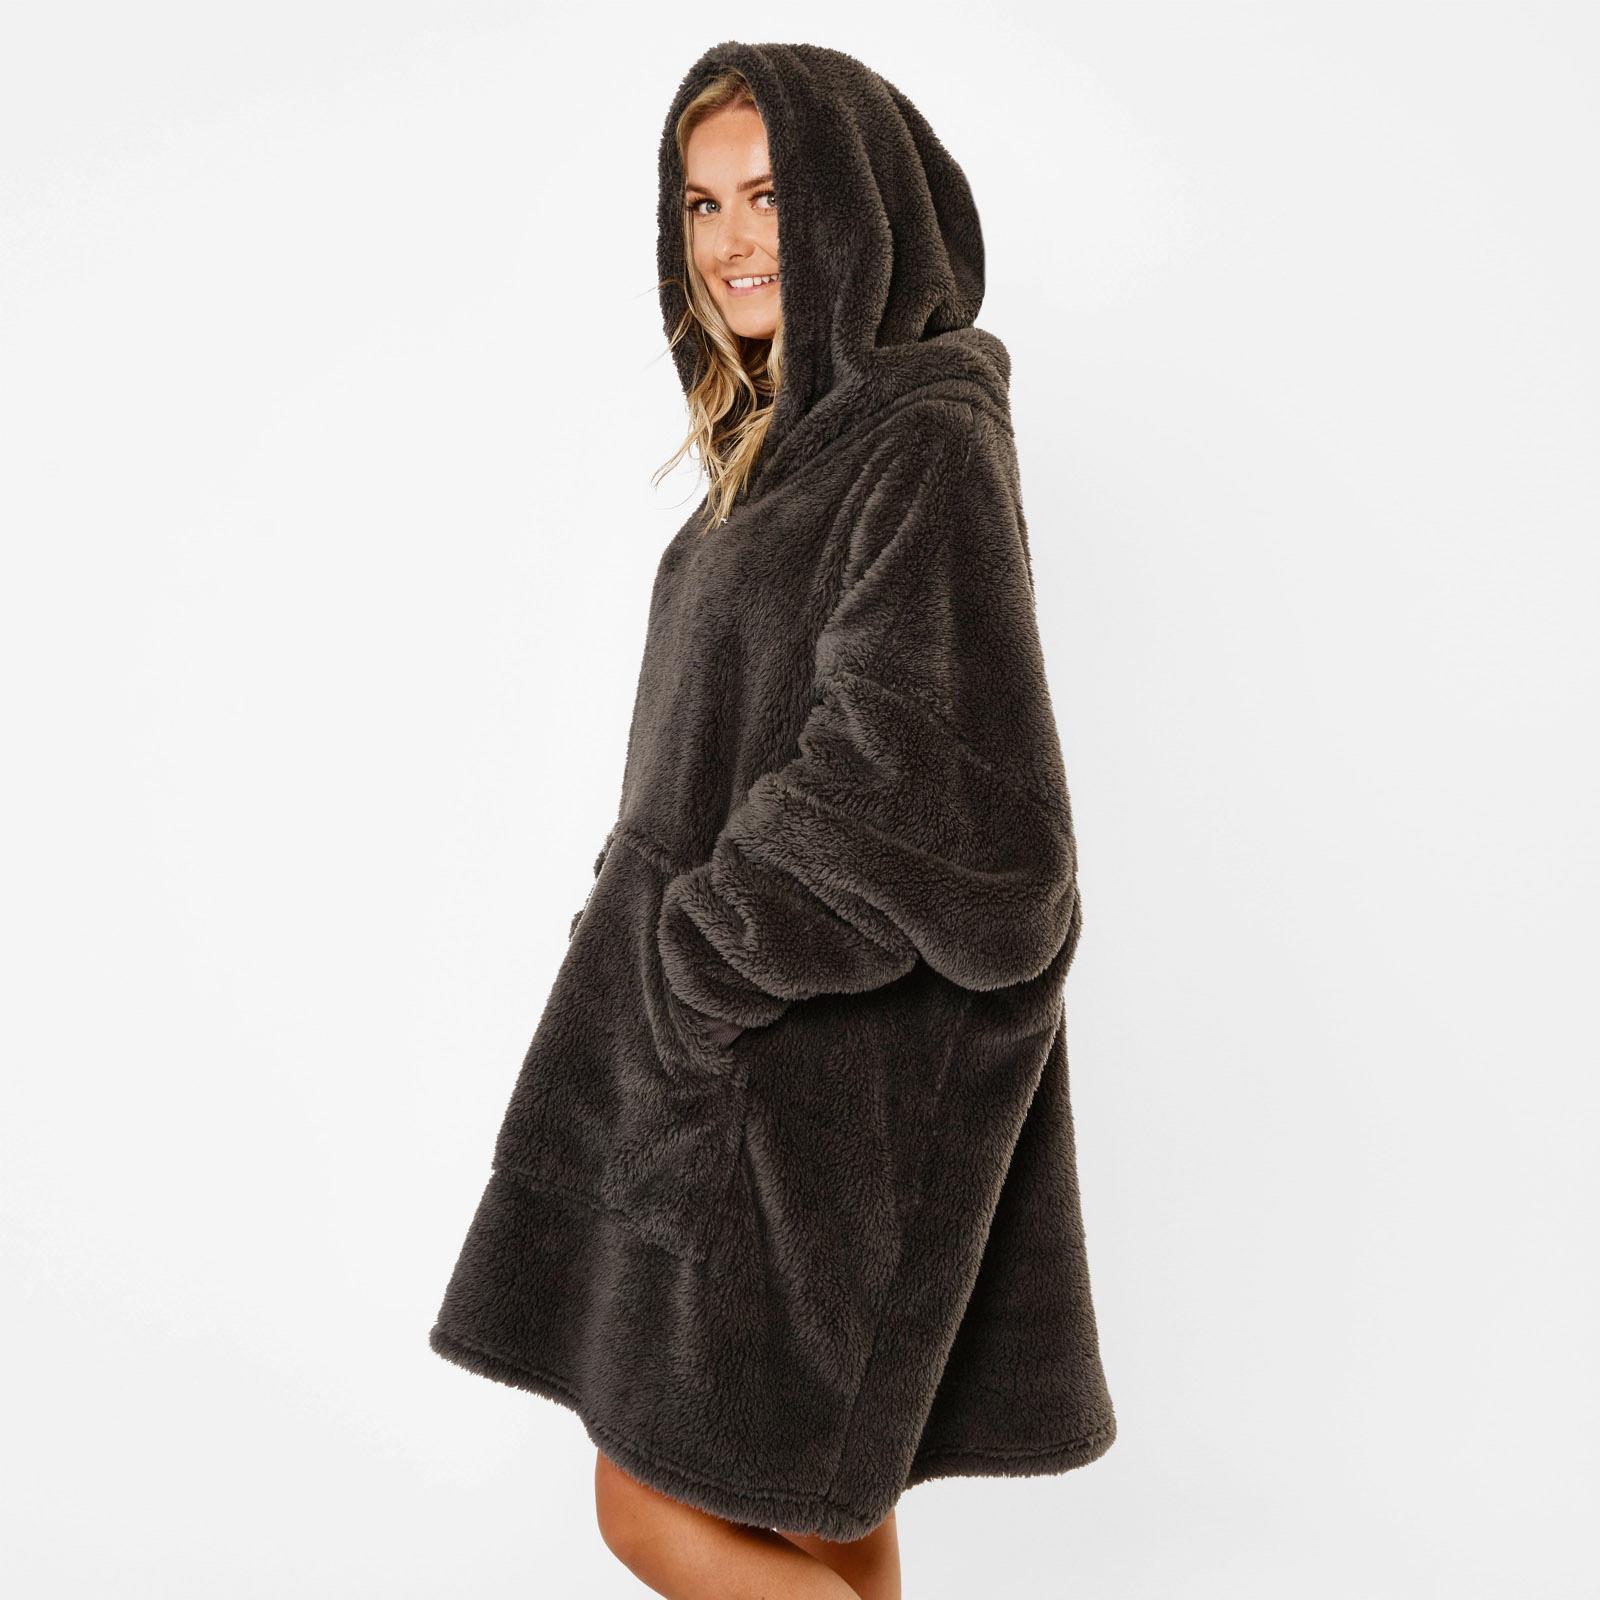 thumbnail 7 - Brentfords-Teddy-Fleece-Hoodie-Blanket-Oversized-Giant-Wearable-Adults-Kids-UK